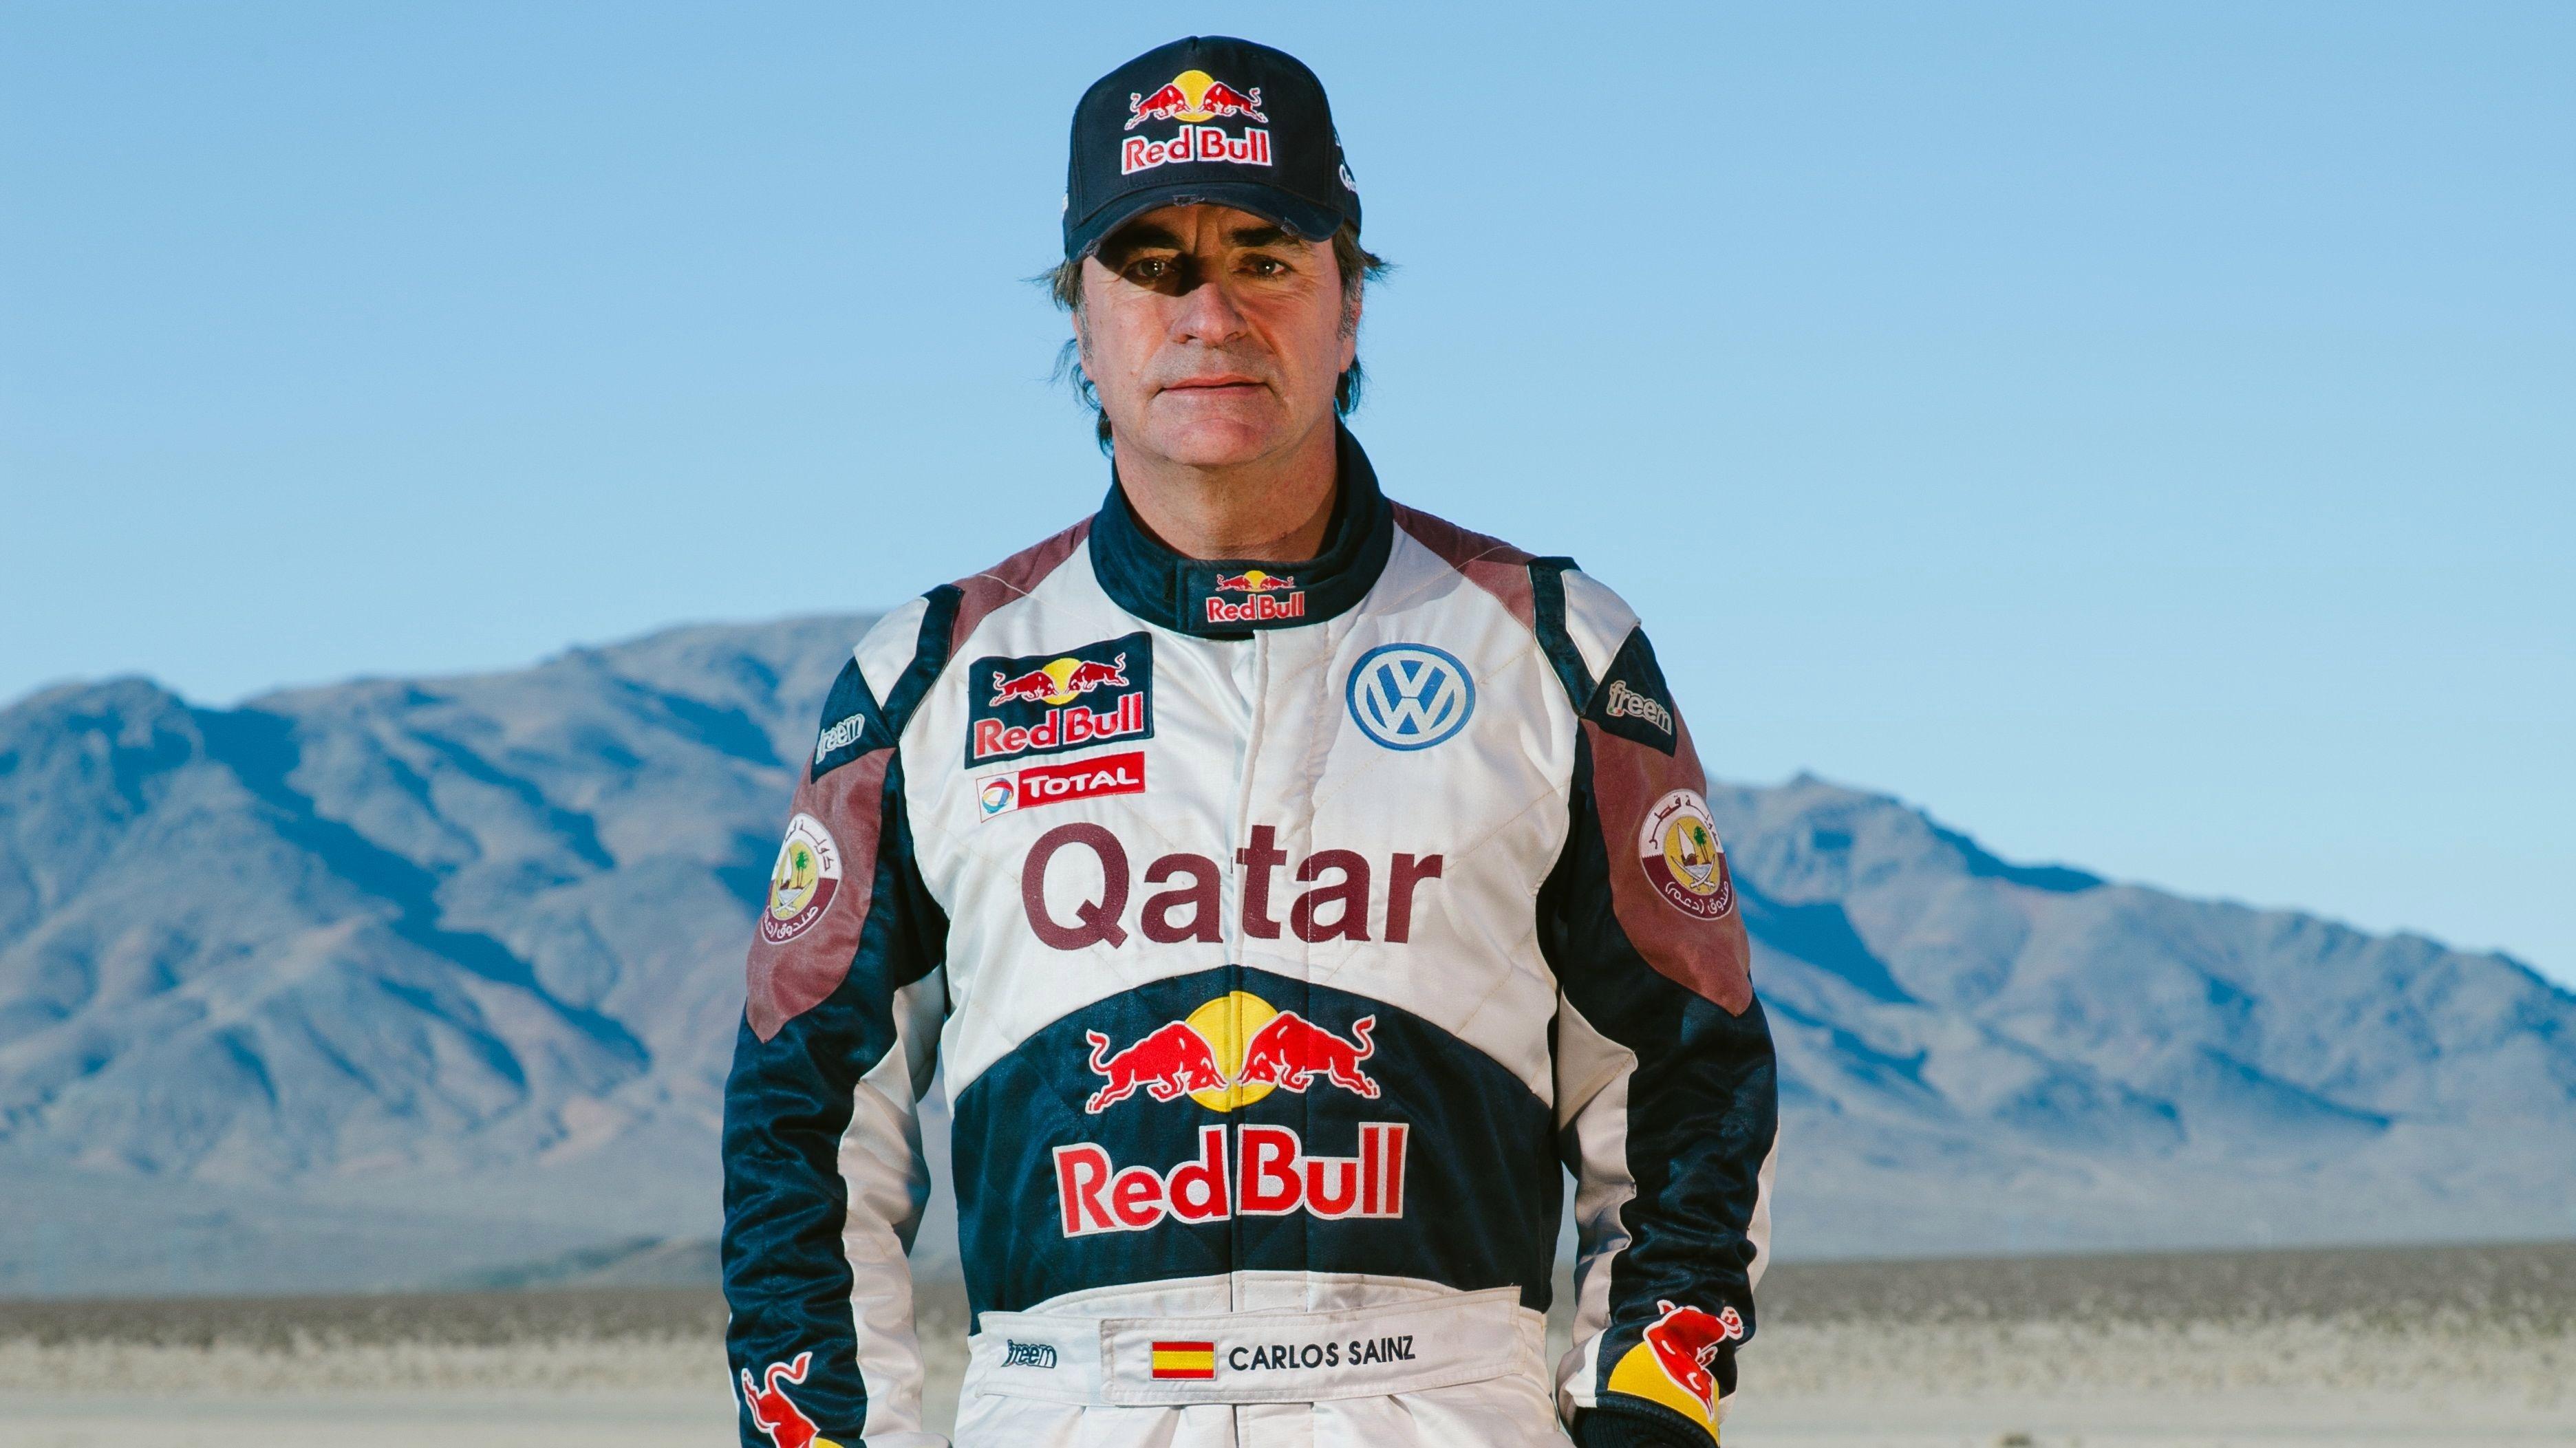 Tidenes 50 beste racerførere - del 4